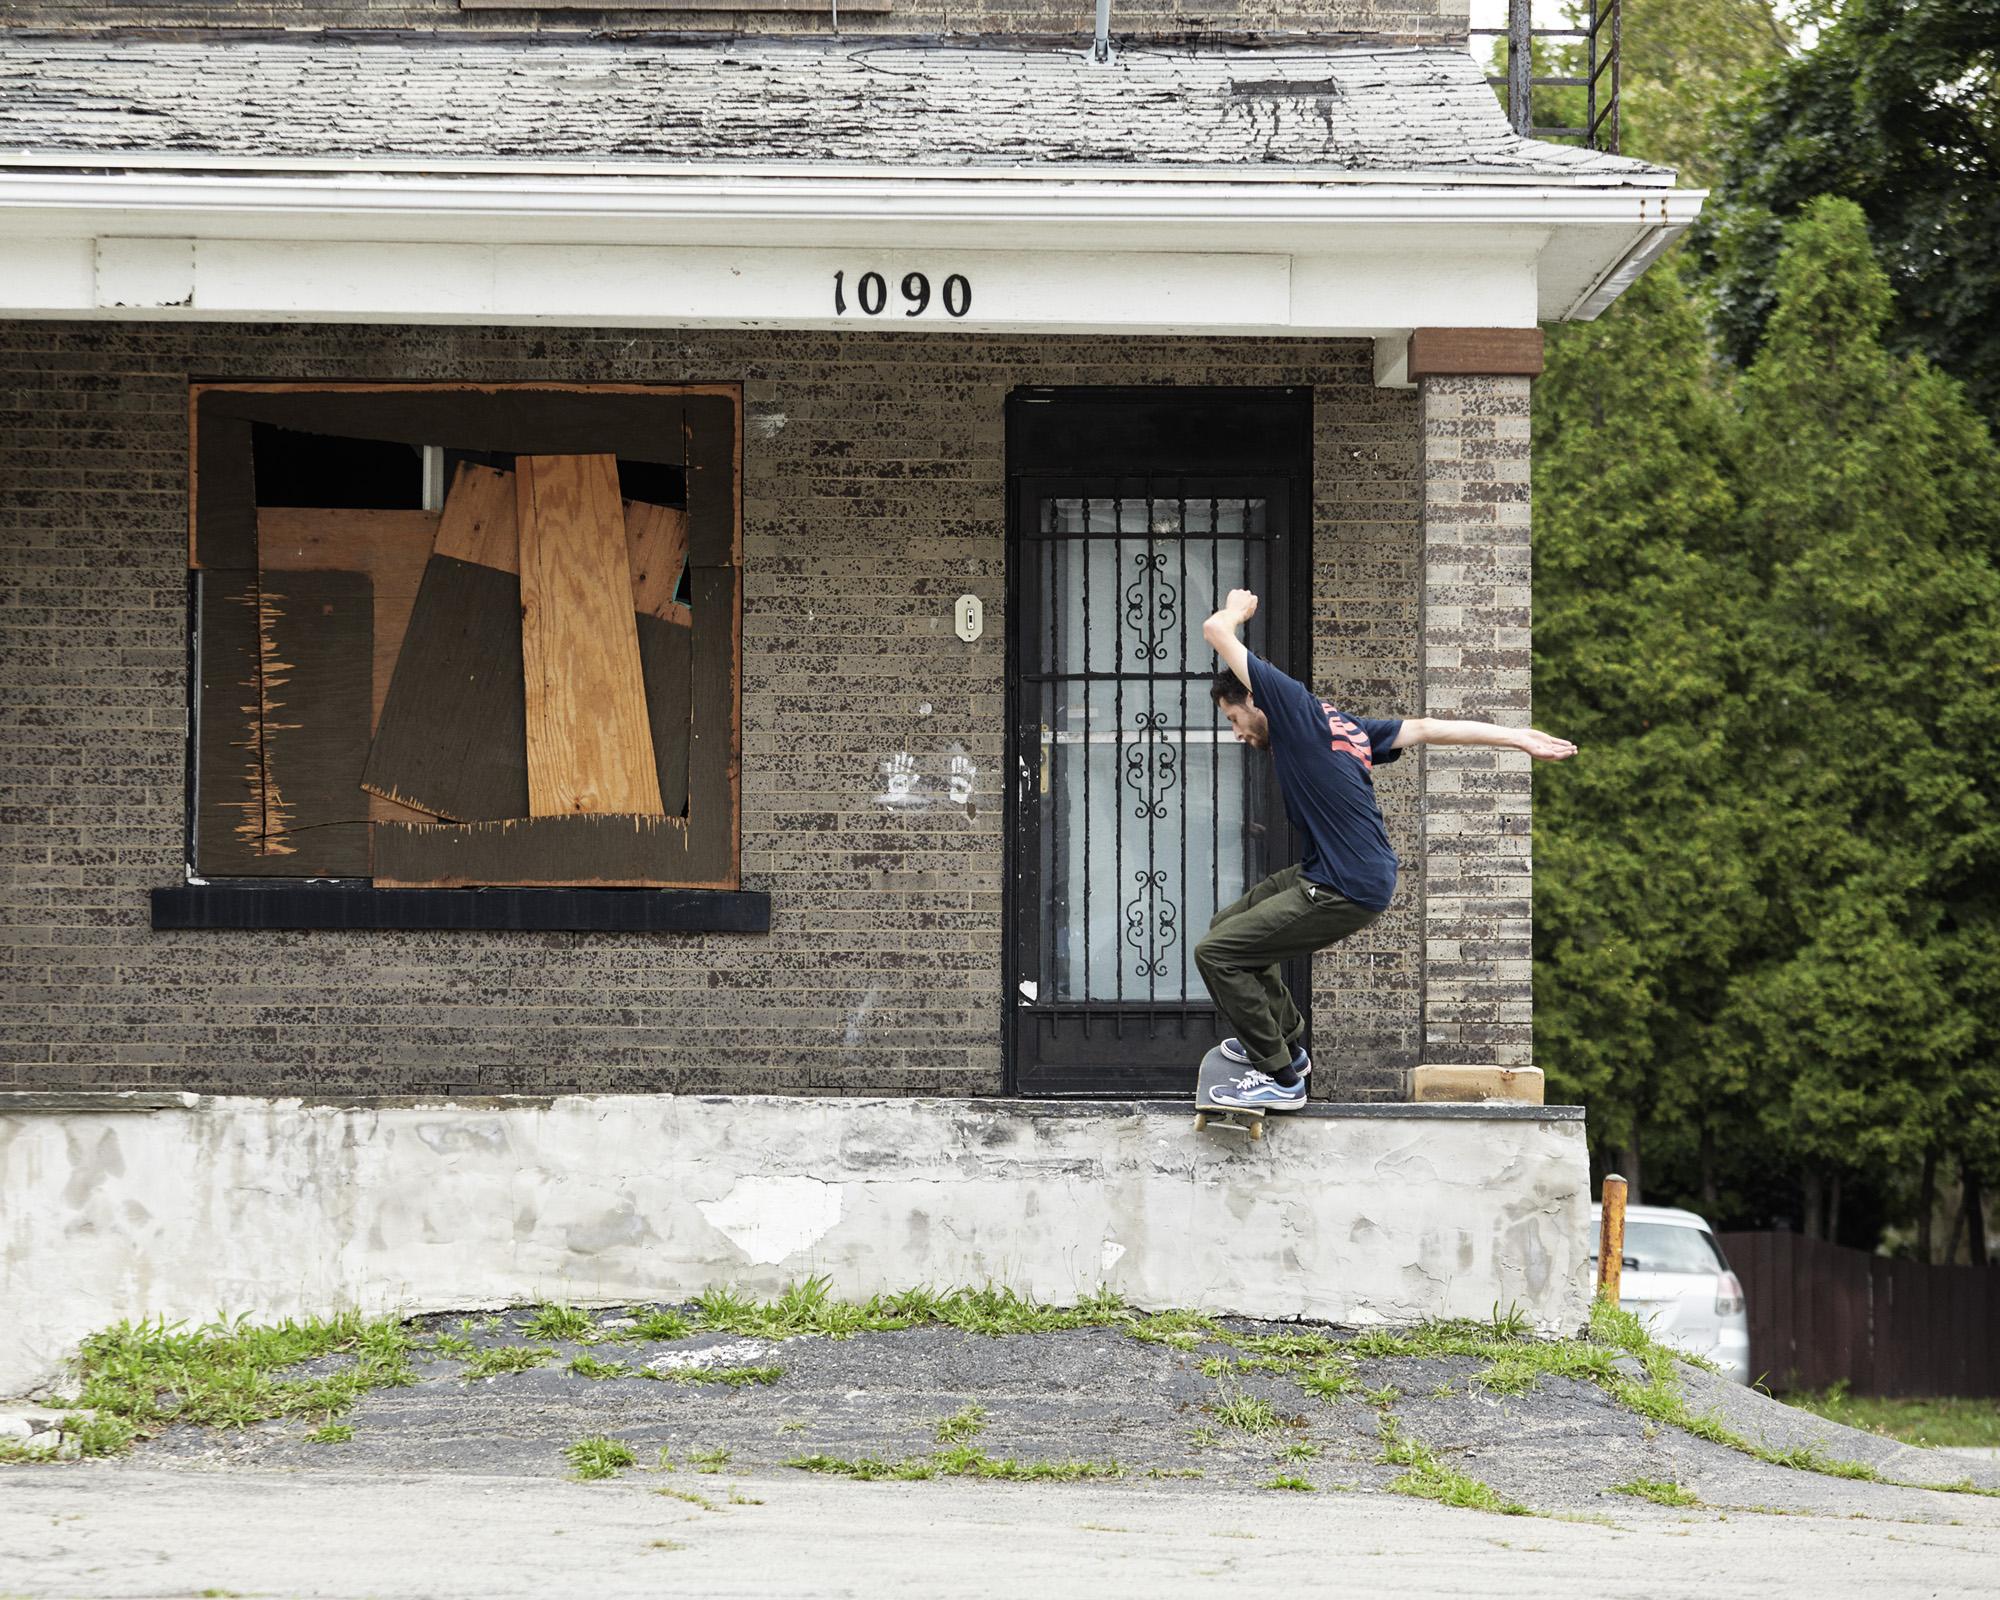 Wallie Lipslide - Rochester, NY - Photo: Will Jivcoff